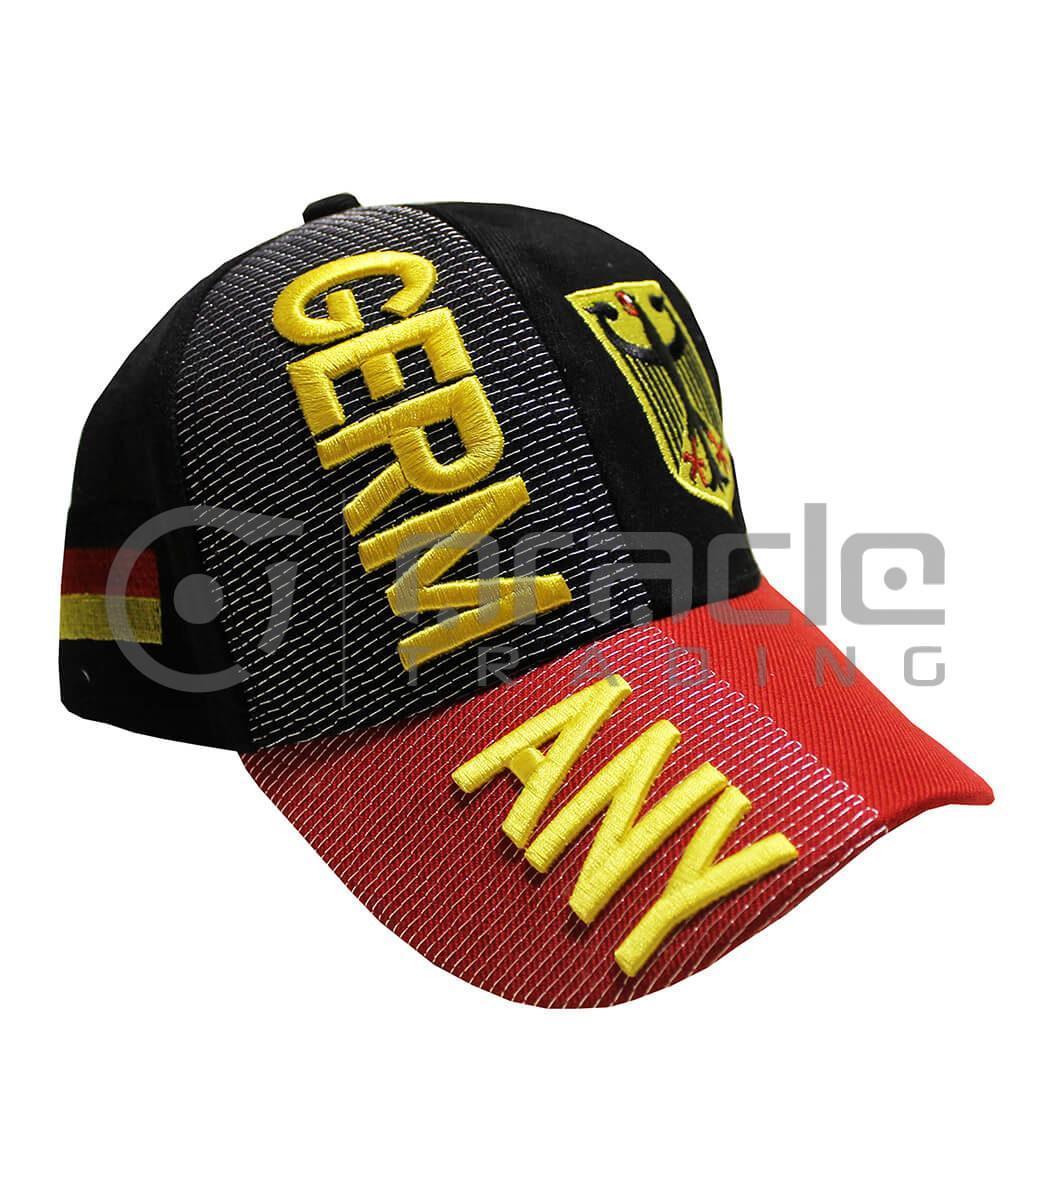 3D Germany Hat - Gold - Eagle